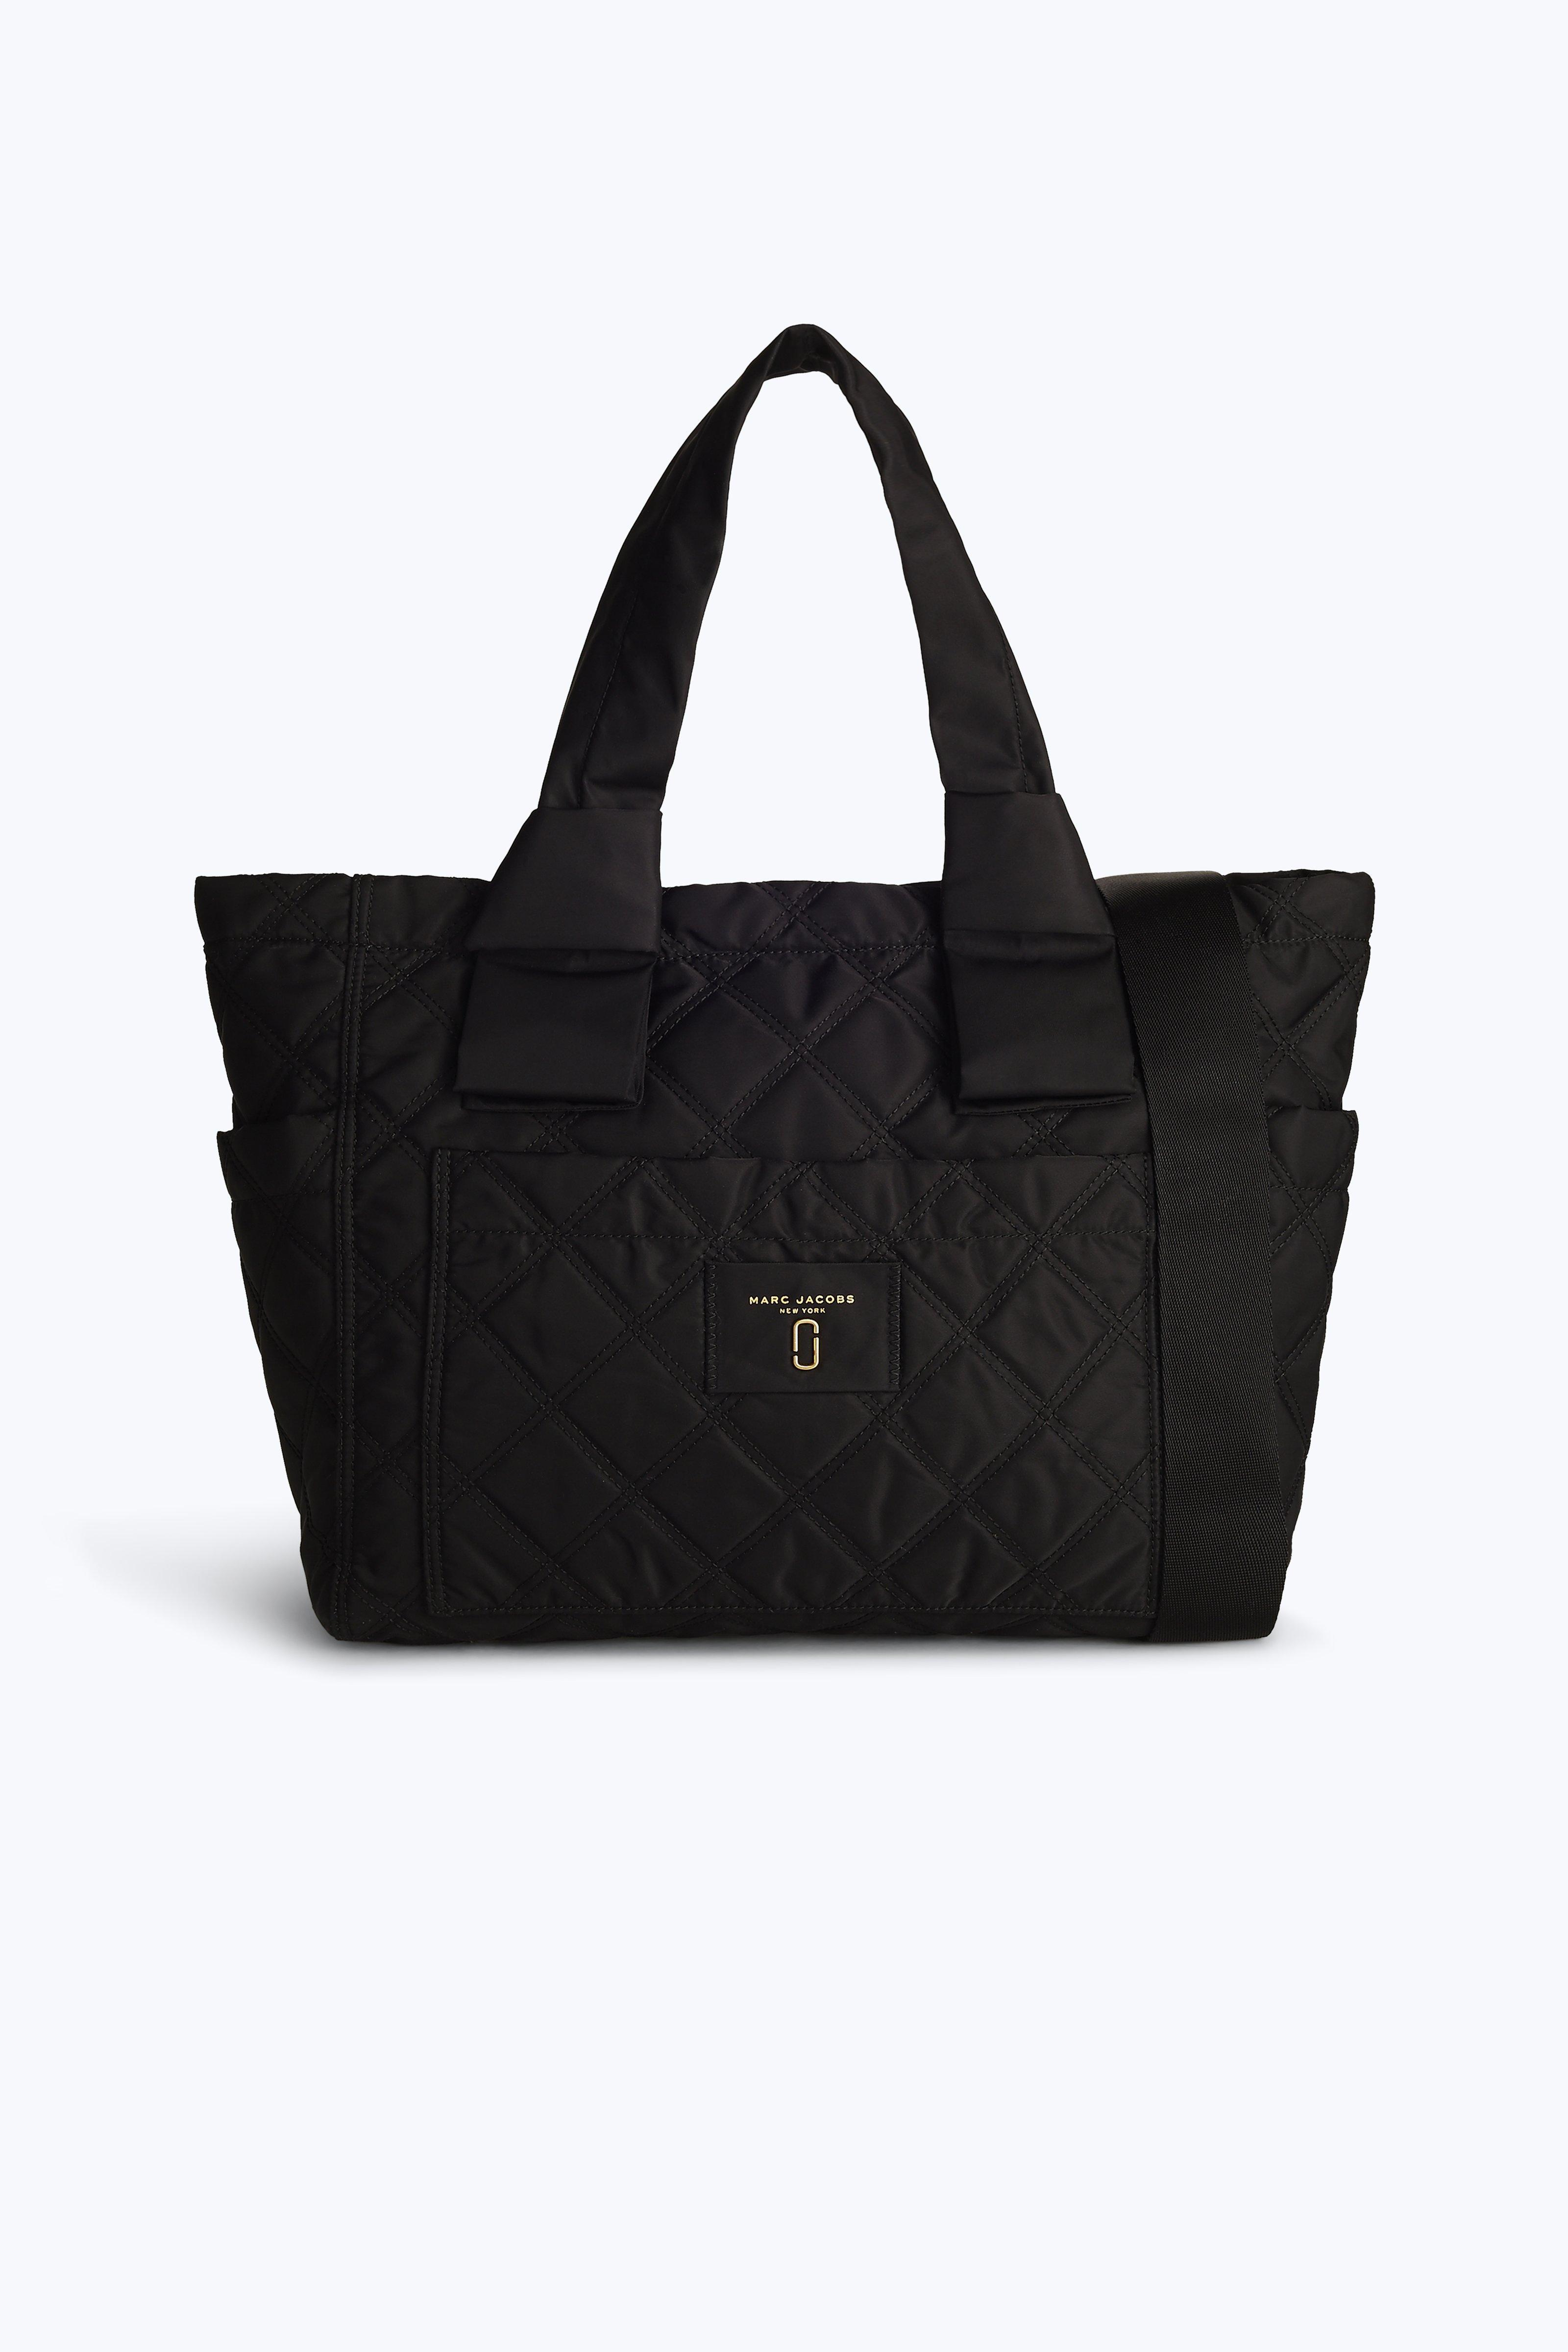 b6f6b9e2e8b5 Lyst - Marc Jacobs Nylon Knot Baby Bag in Black